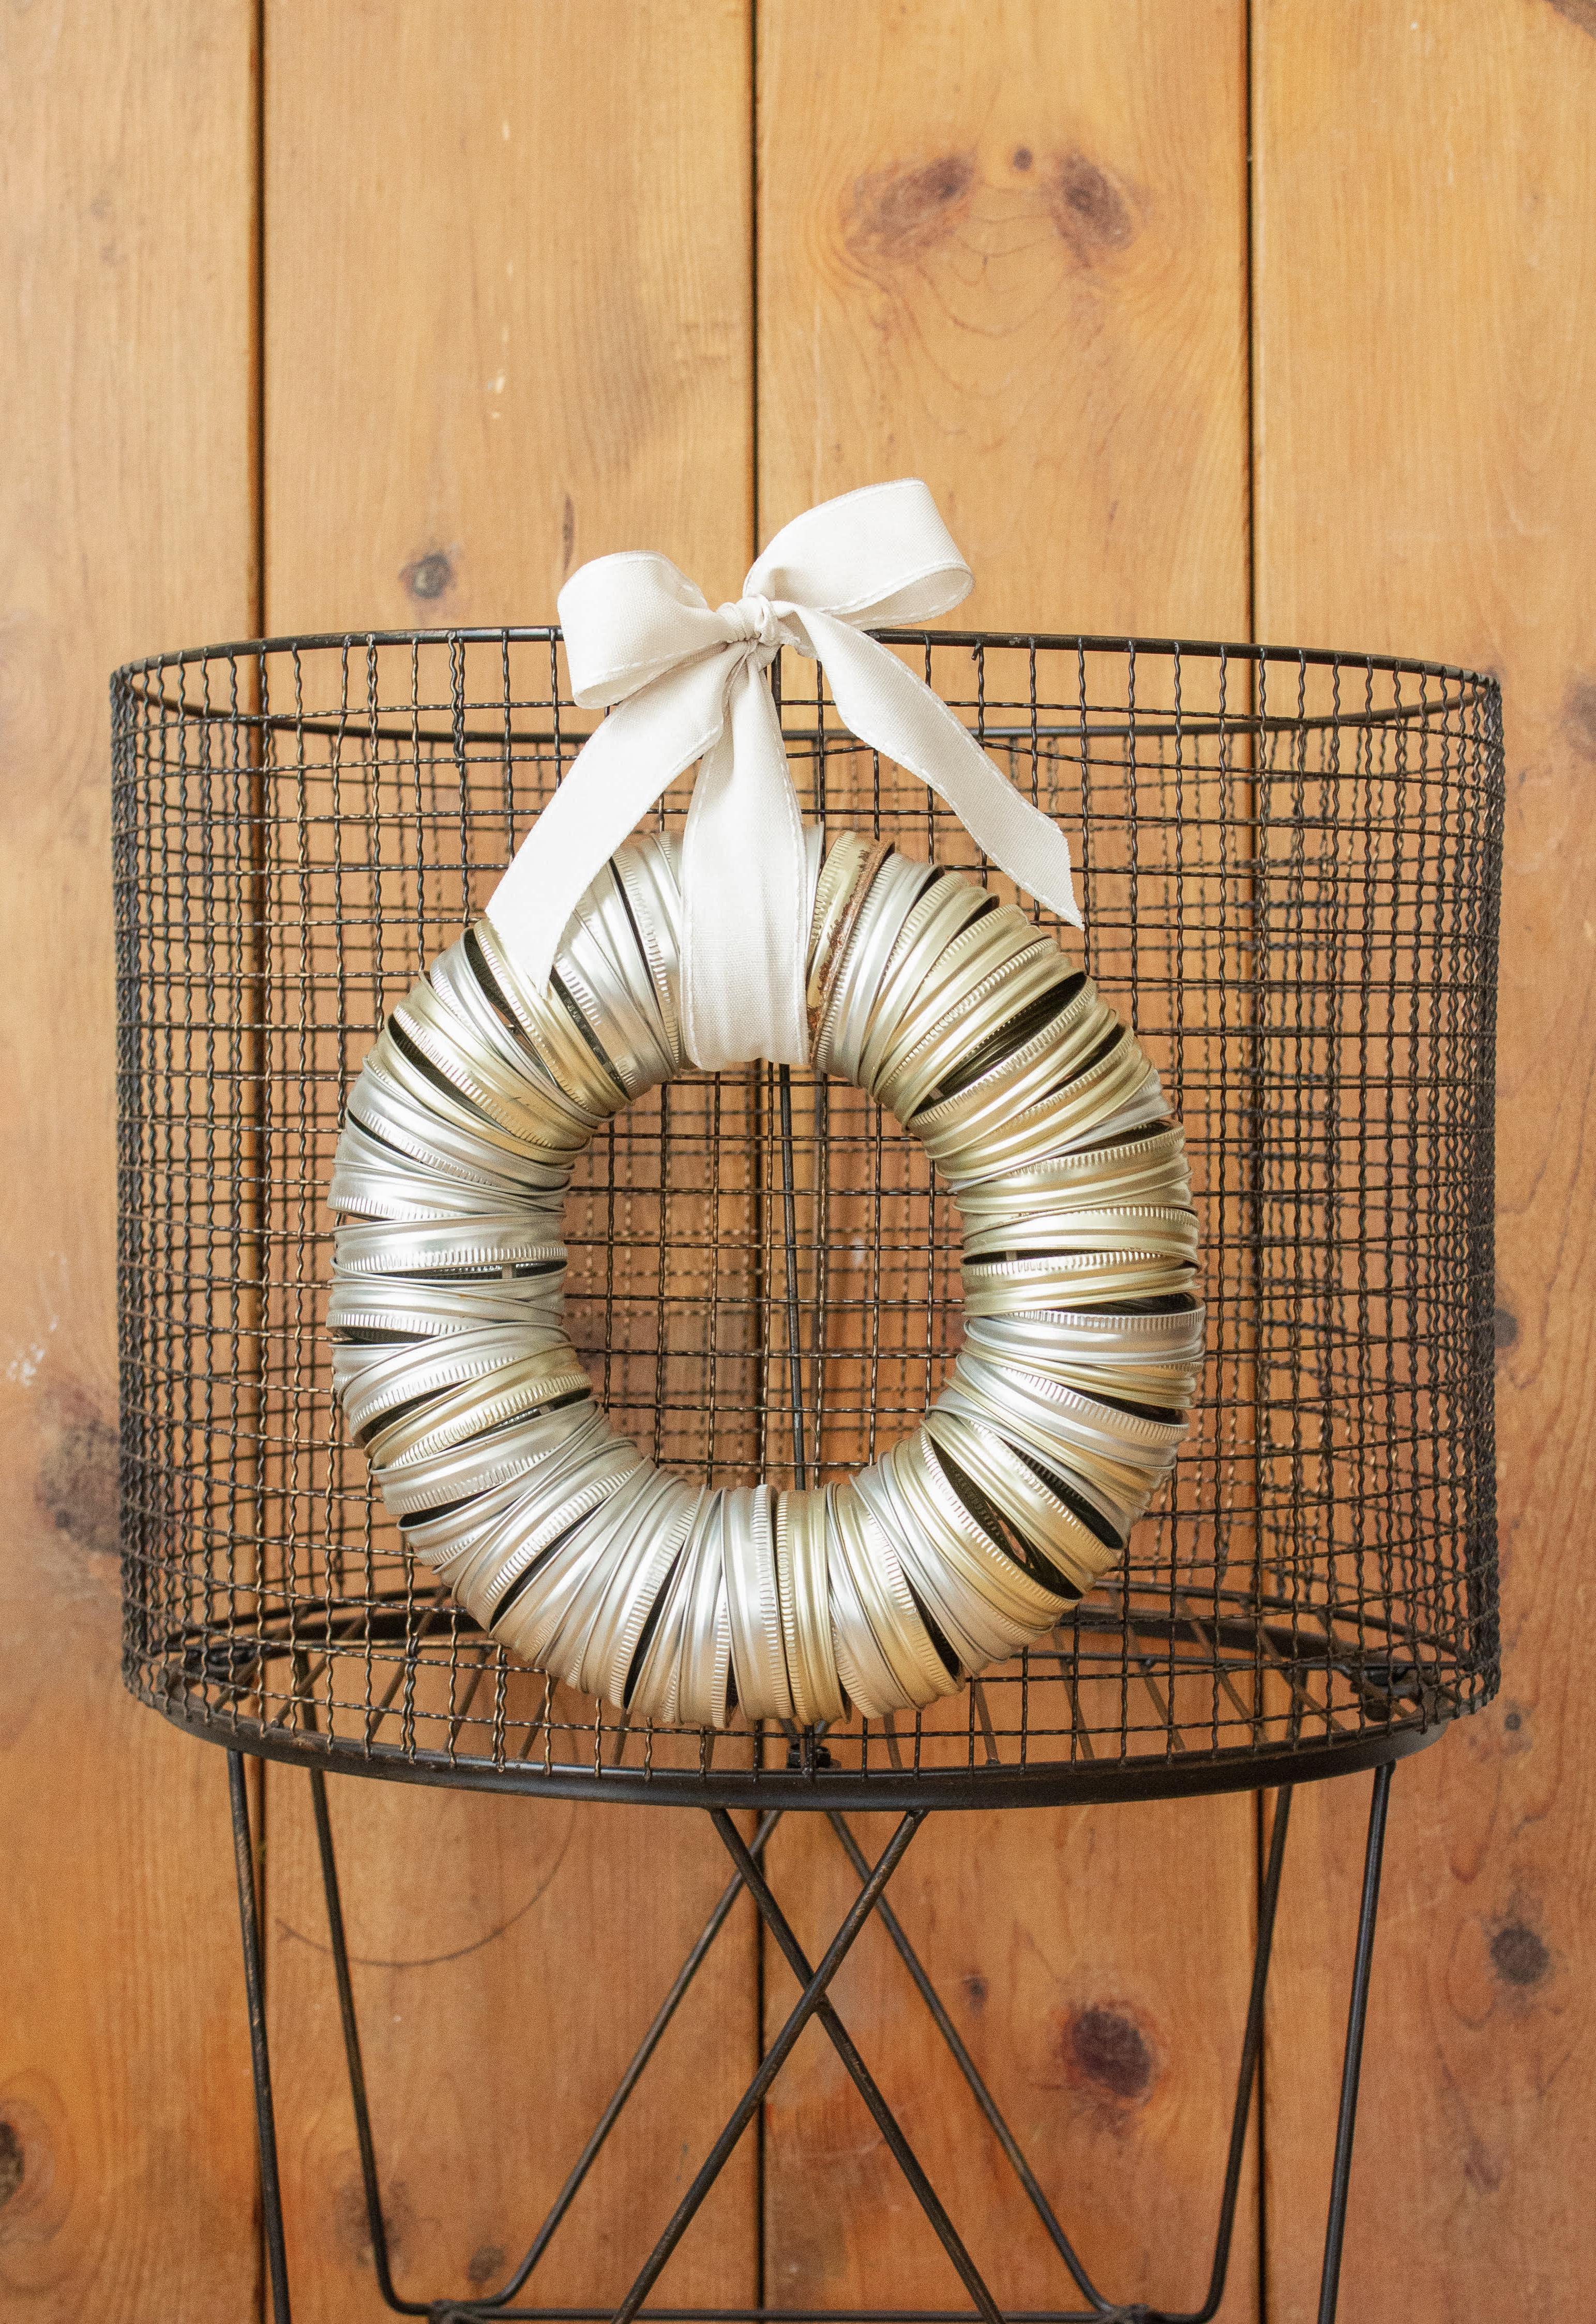 40 Diy Beautiful Birthday Party Decoration Ideas: How To Make Beautiful Wreaths 40 Handmade DIY Tutorials